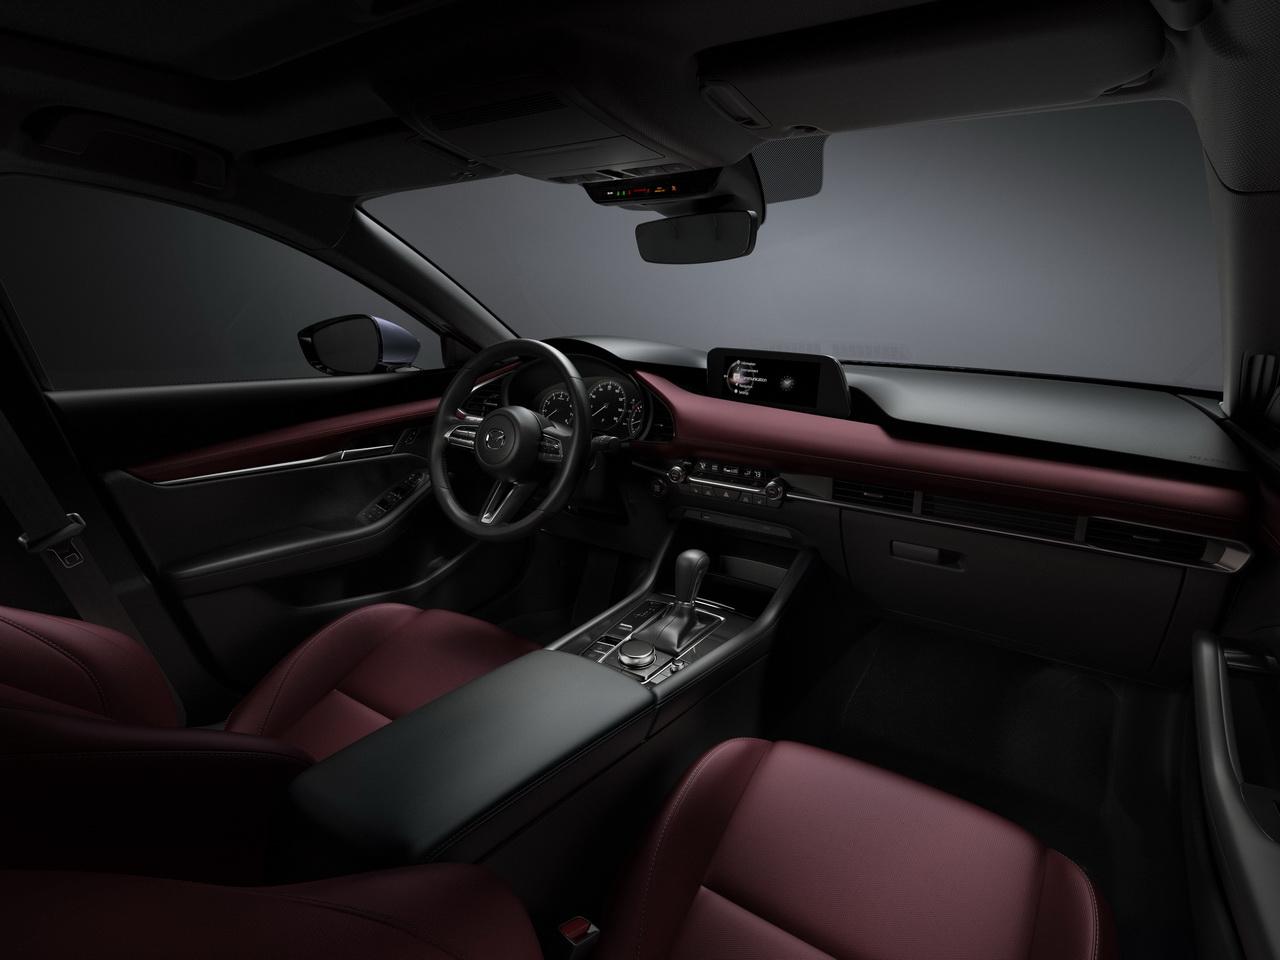 2018 - [Mazda] 3 IV - Page 11 31-mazda3-int-cockpit-burgundy-redimensionner